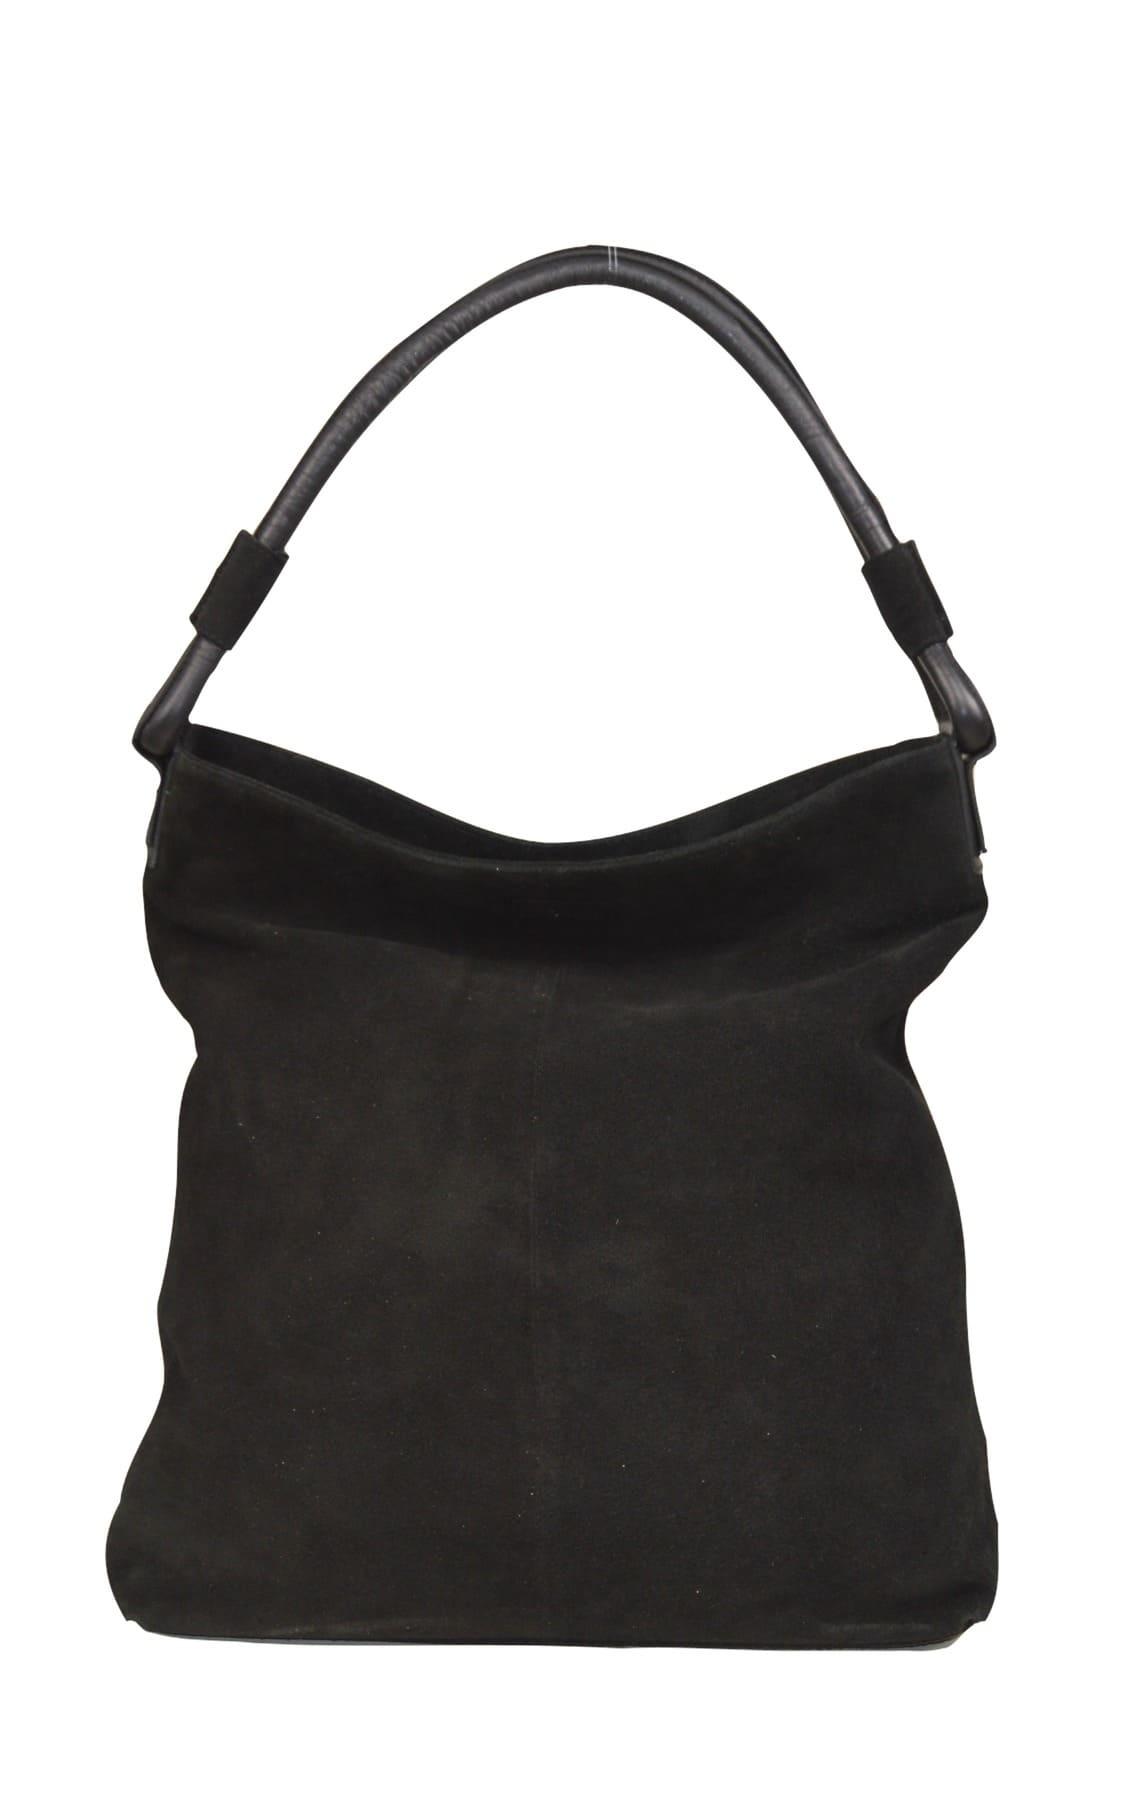 DSTRCT Portland Road Hobo Bag Black